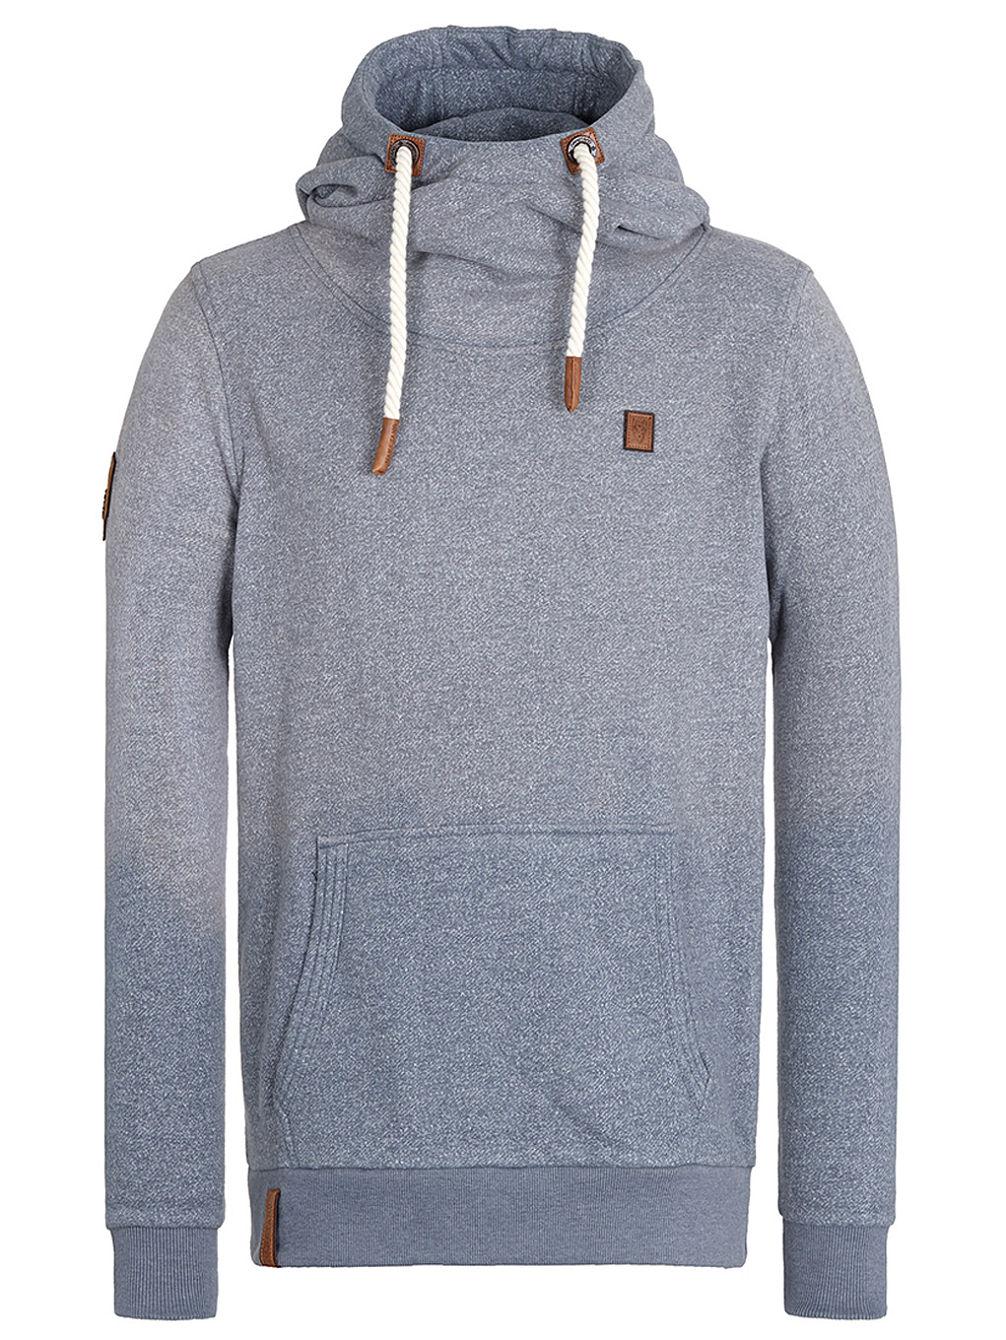 rei-hose-runter-hoodie